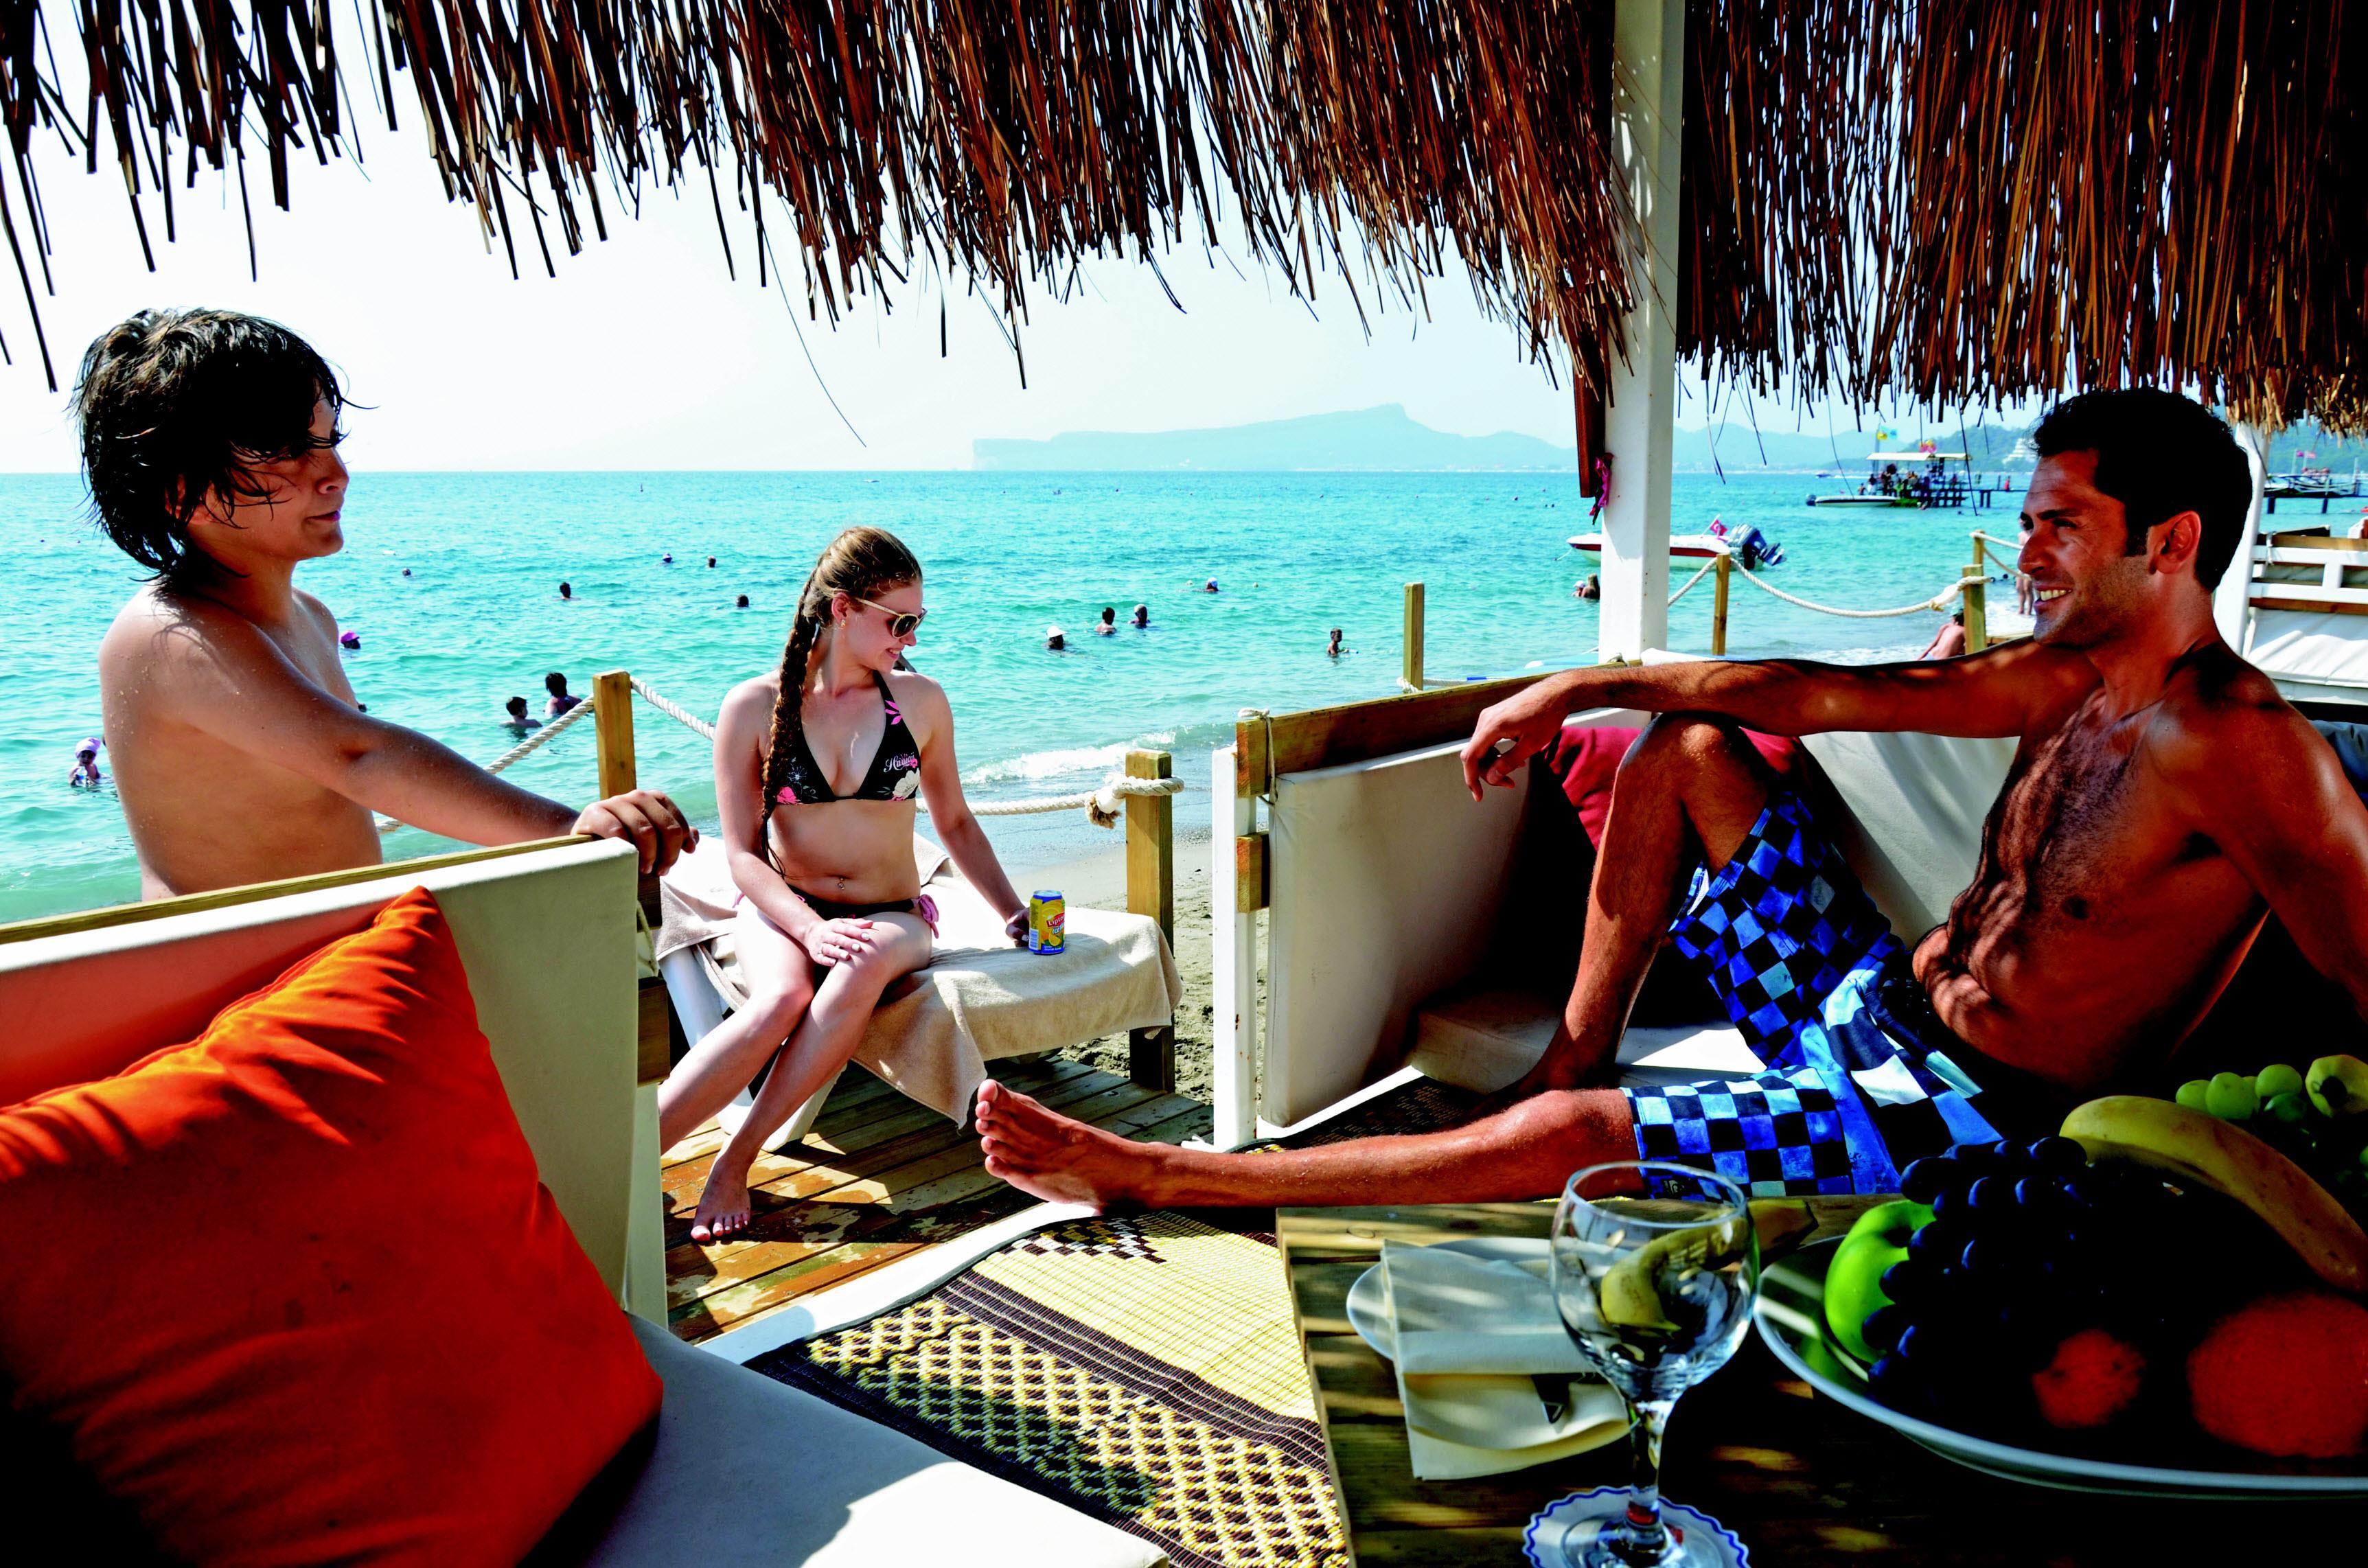 http://www.orextravel.sk/OREX/hotelphotos/ulusoy-kemer-holiday-club-area-0013.jpg